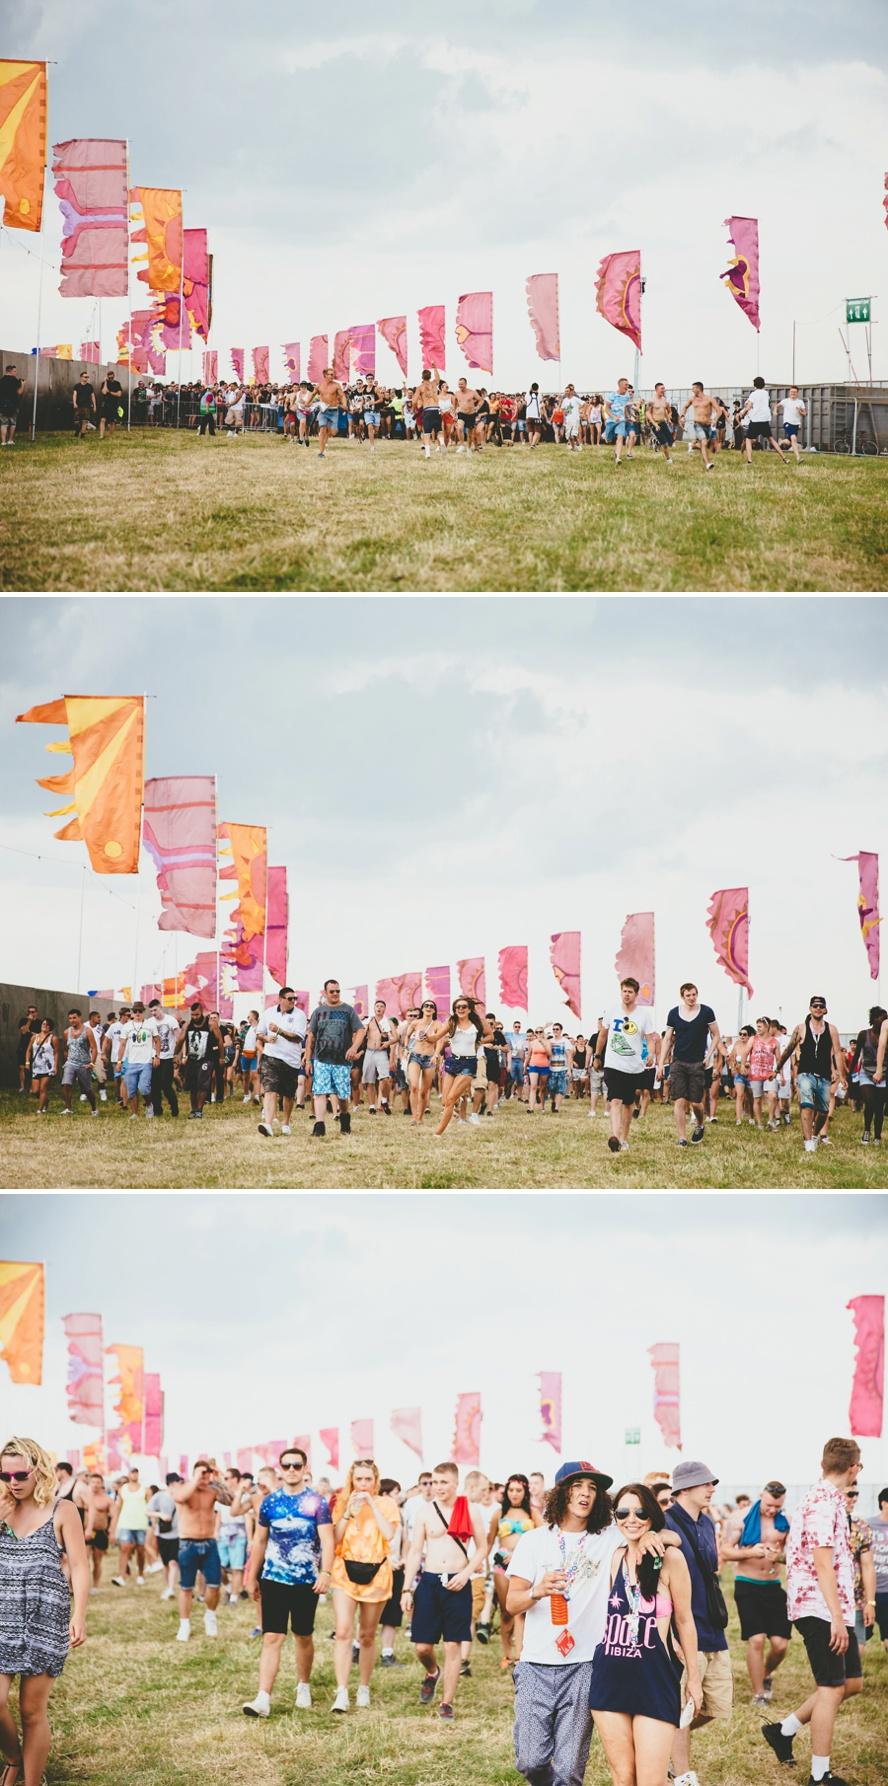 Global Gathering festival